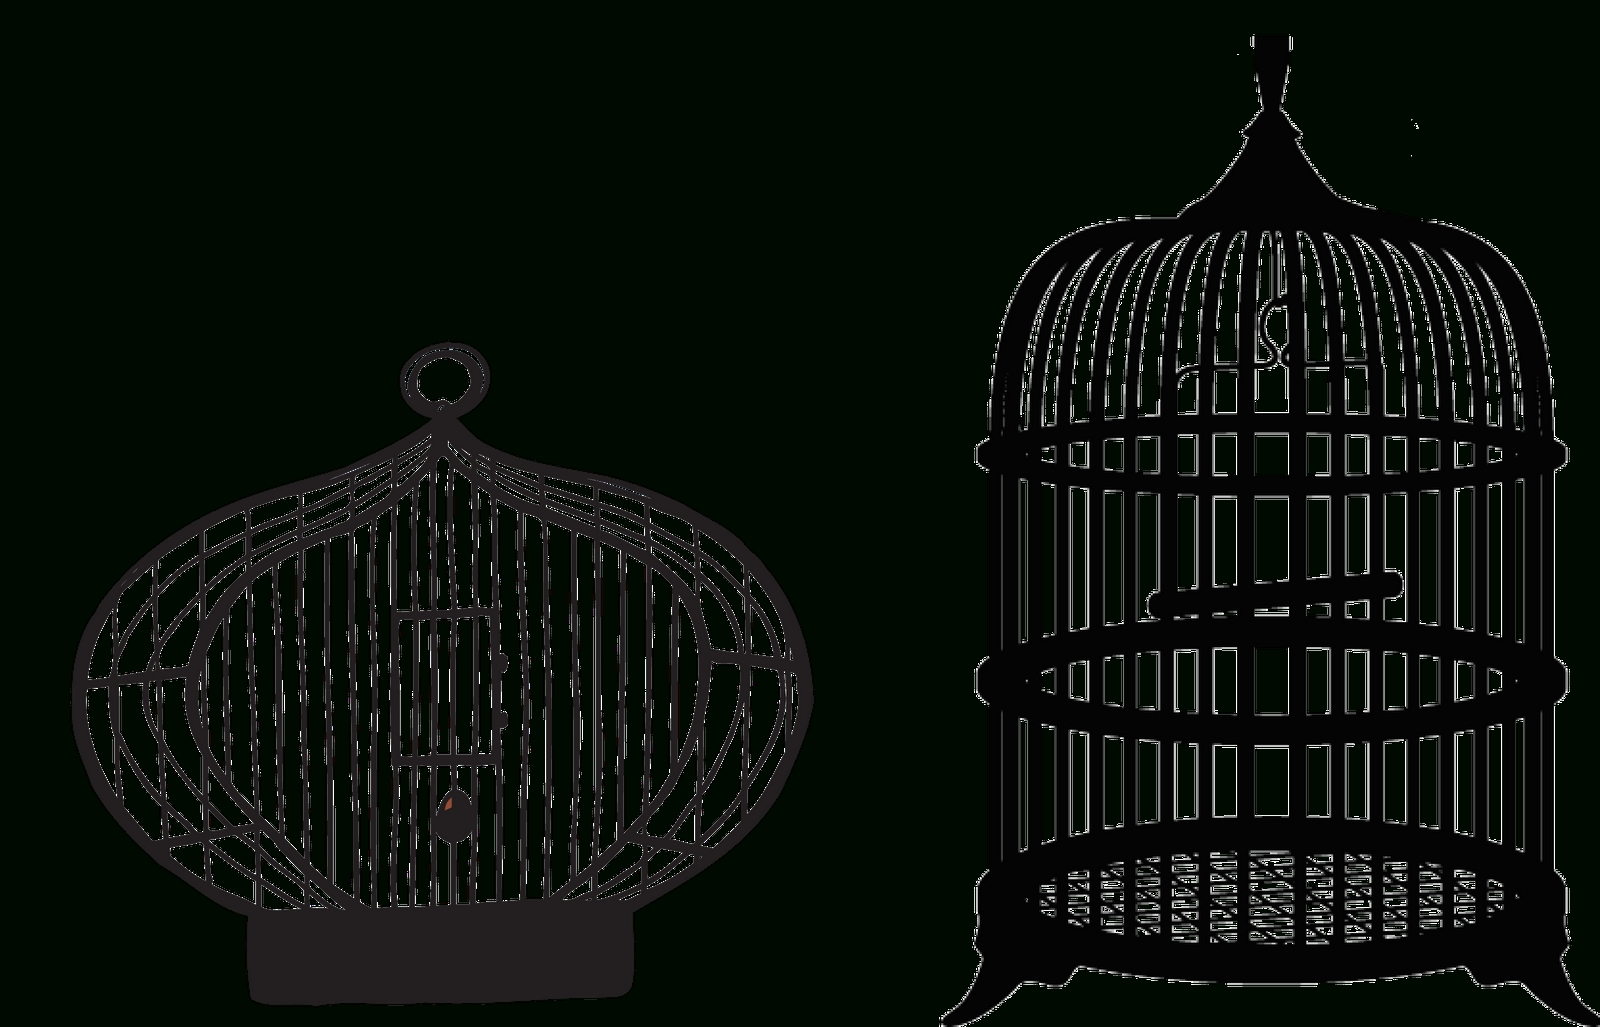 Клетка Для Птиц Png within Картинка Для Плана Сетки